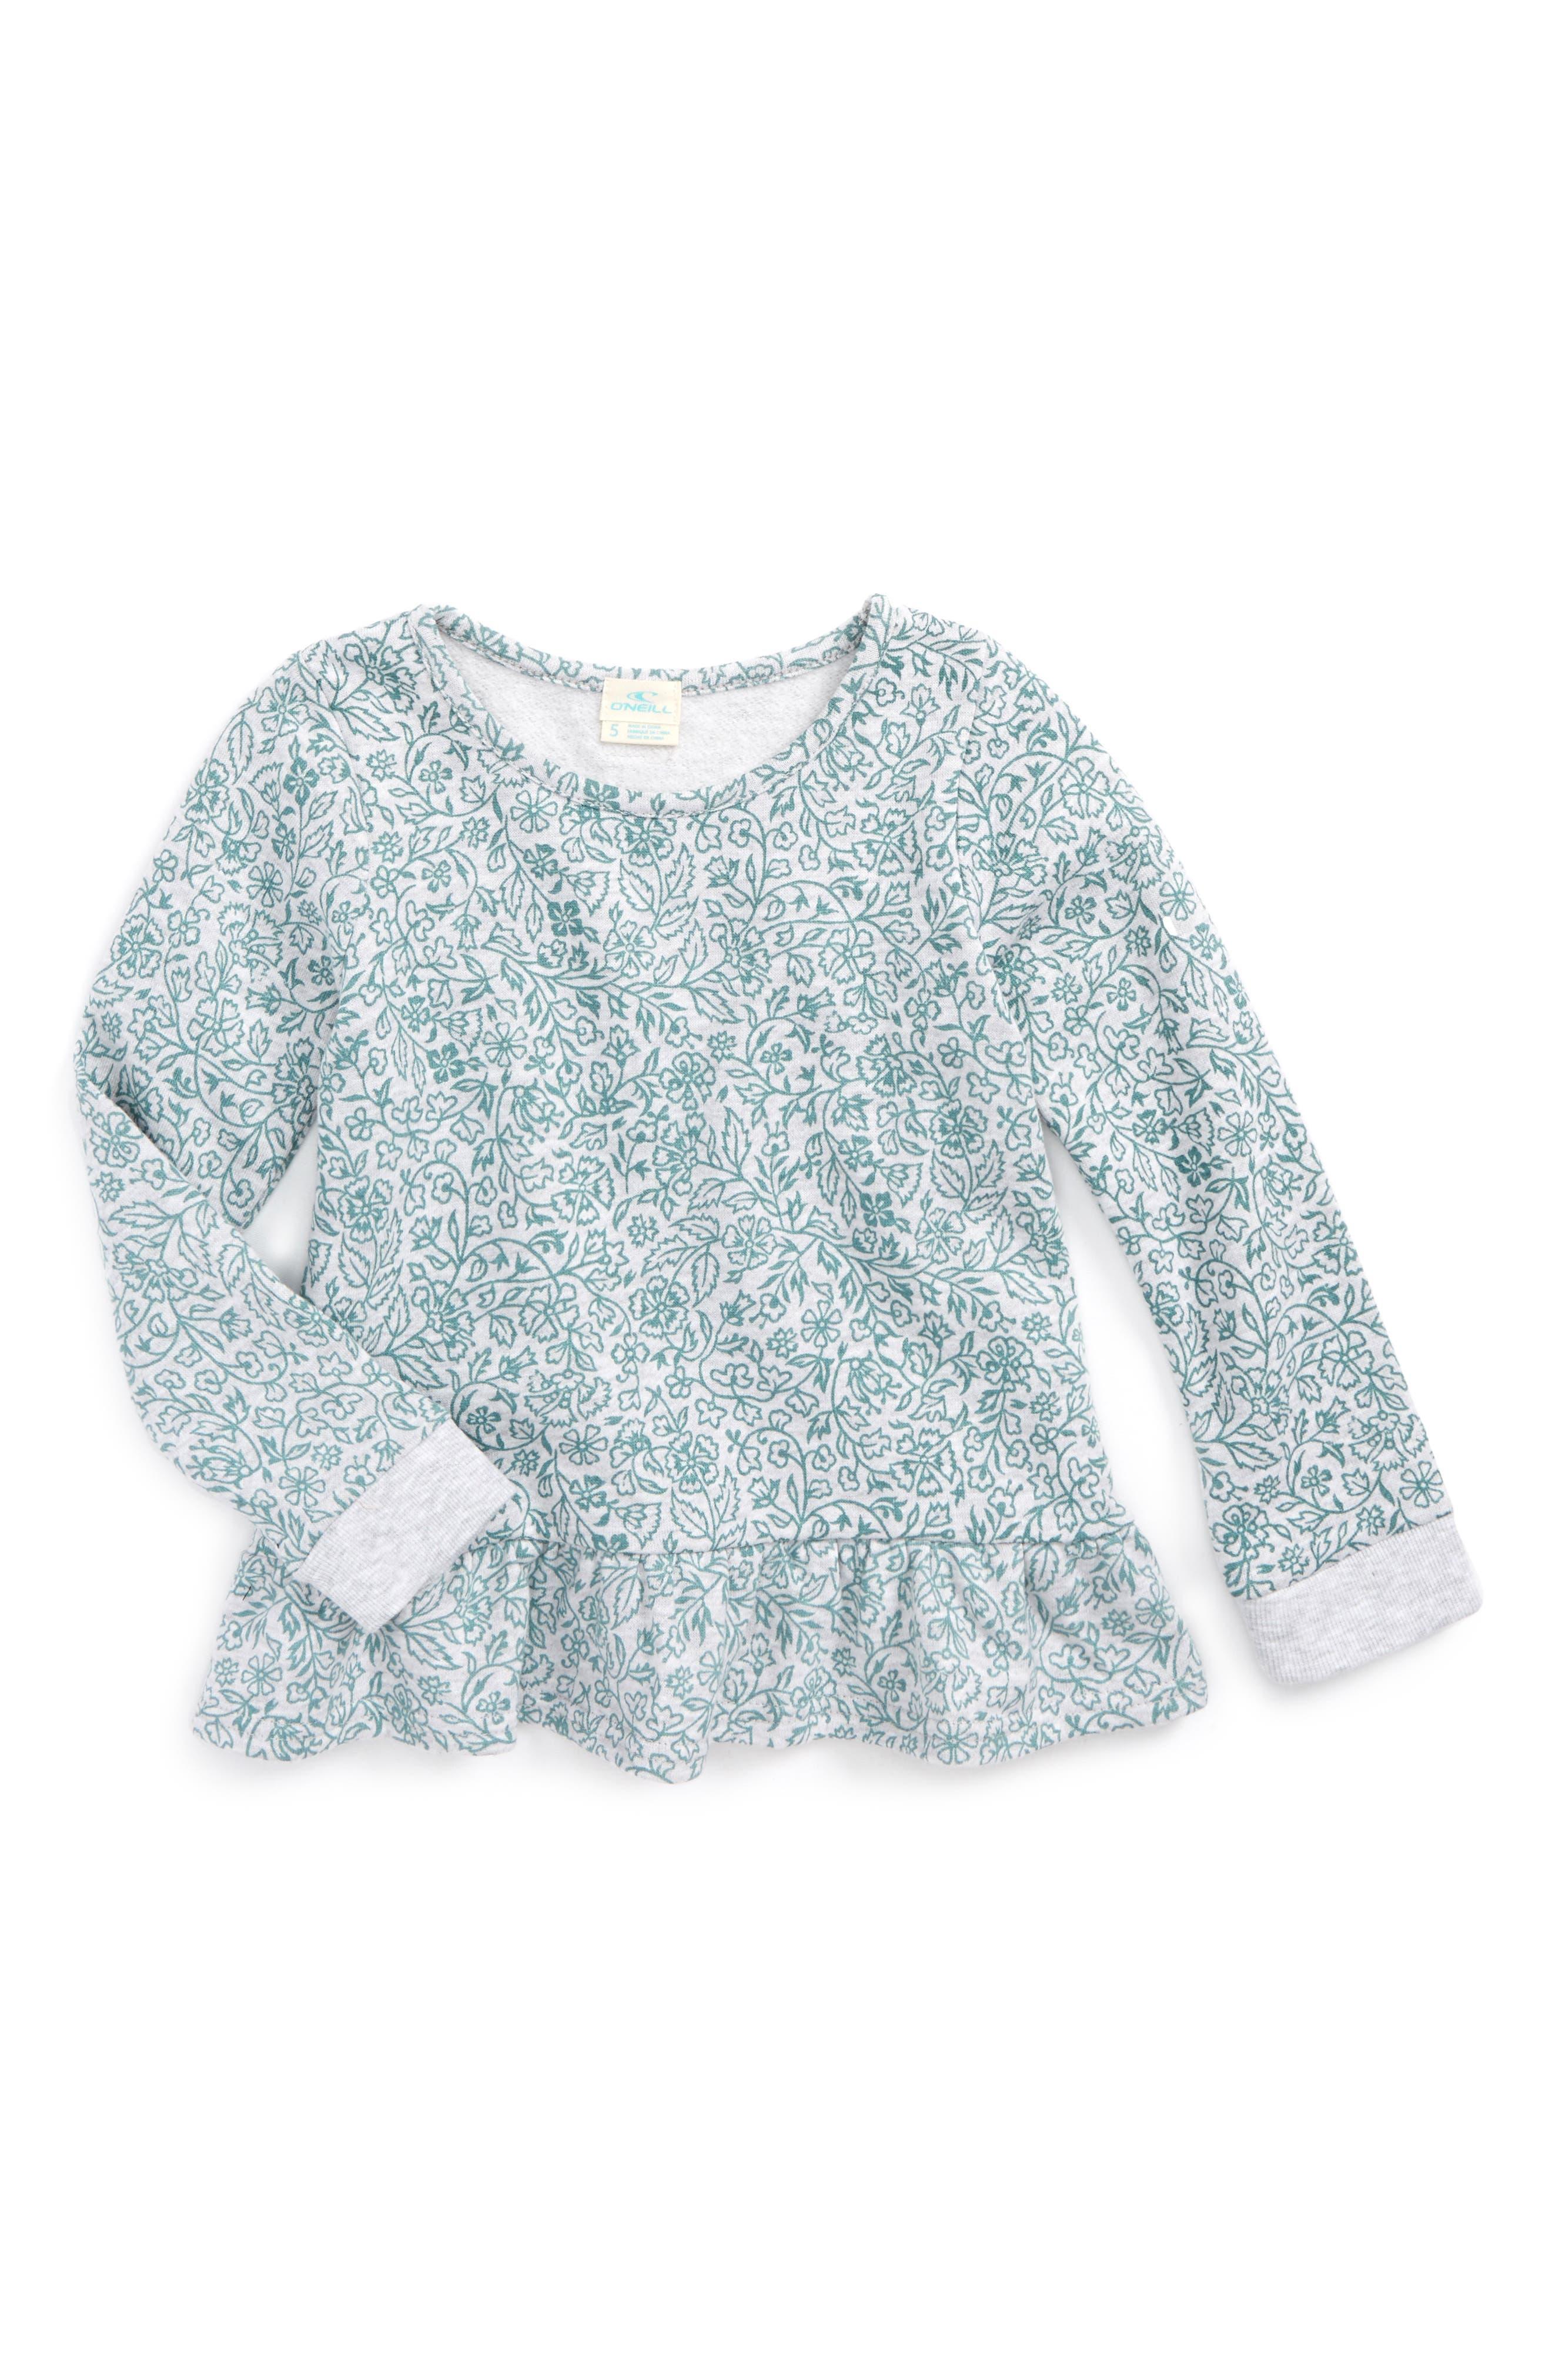 Alternate Image 1 Selected - O'Neill Loveland Fleece Sweatshirt (Toddler Girls & Little Girls)